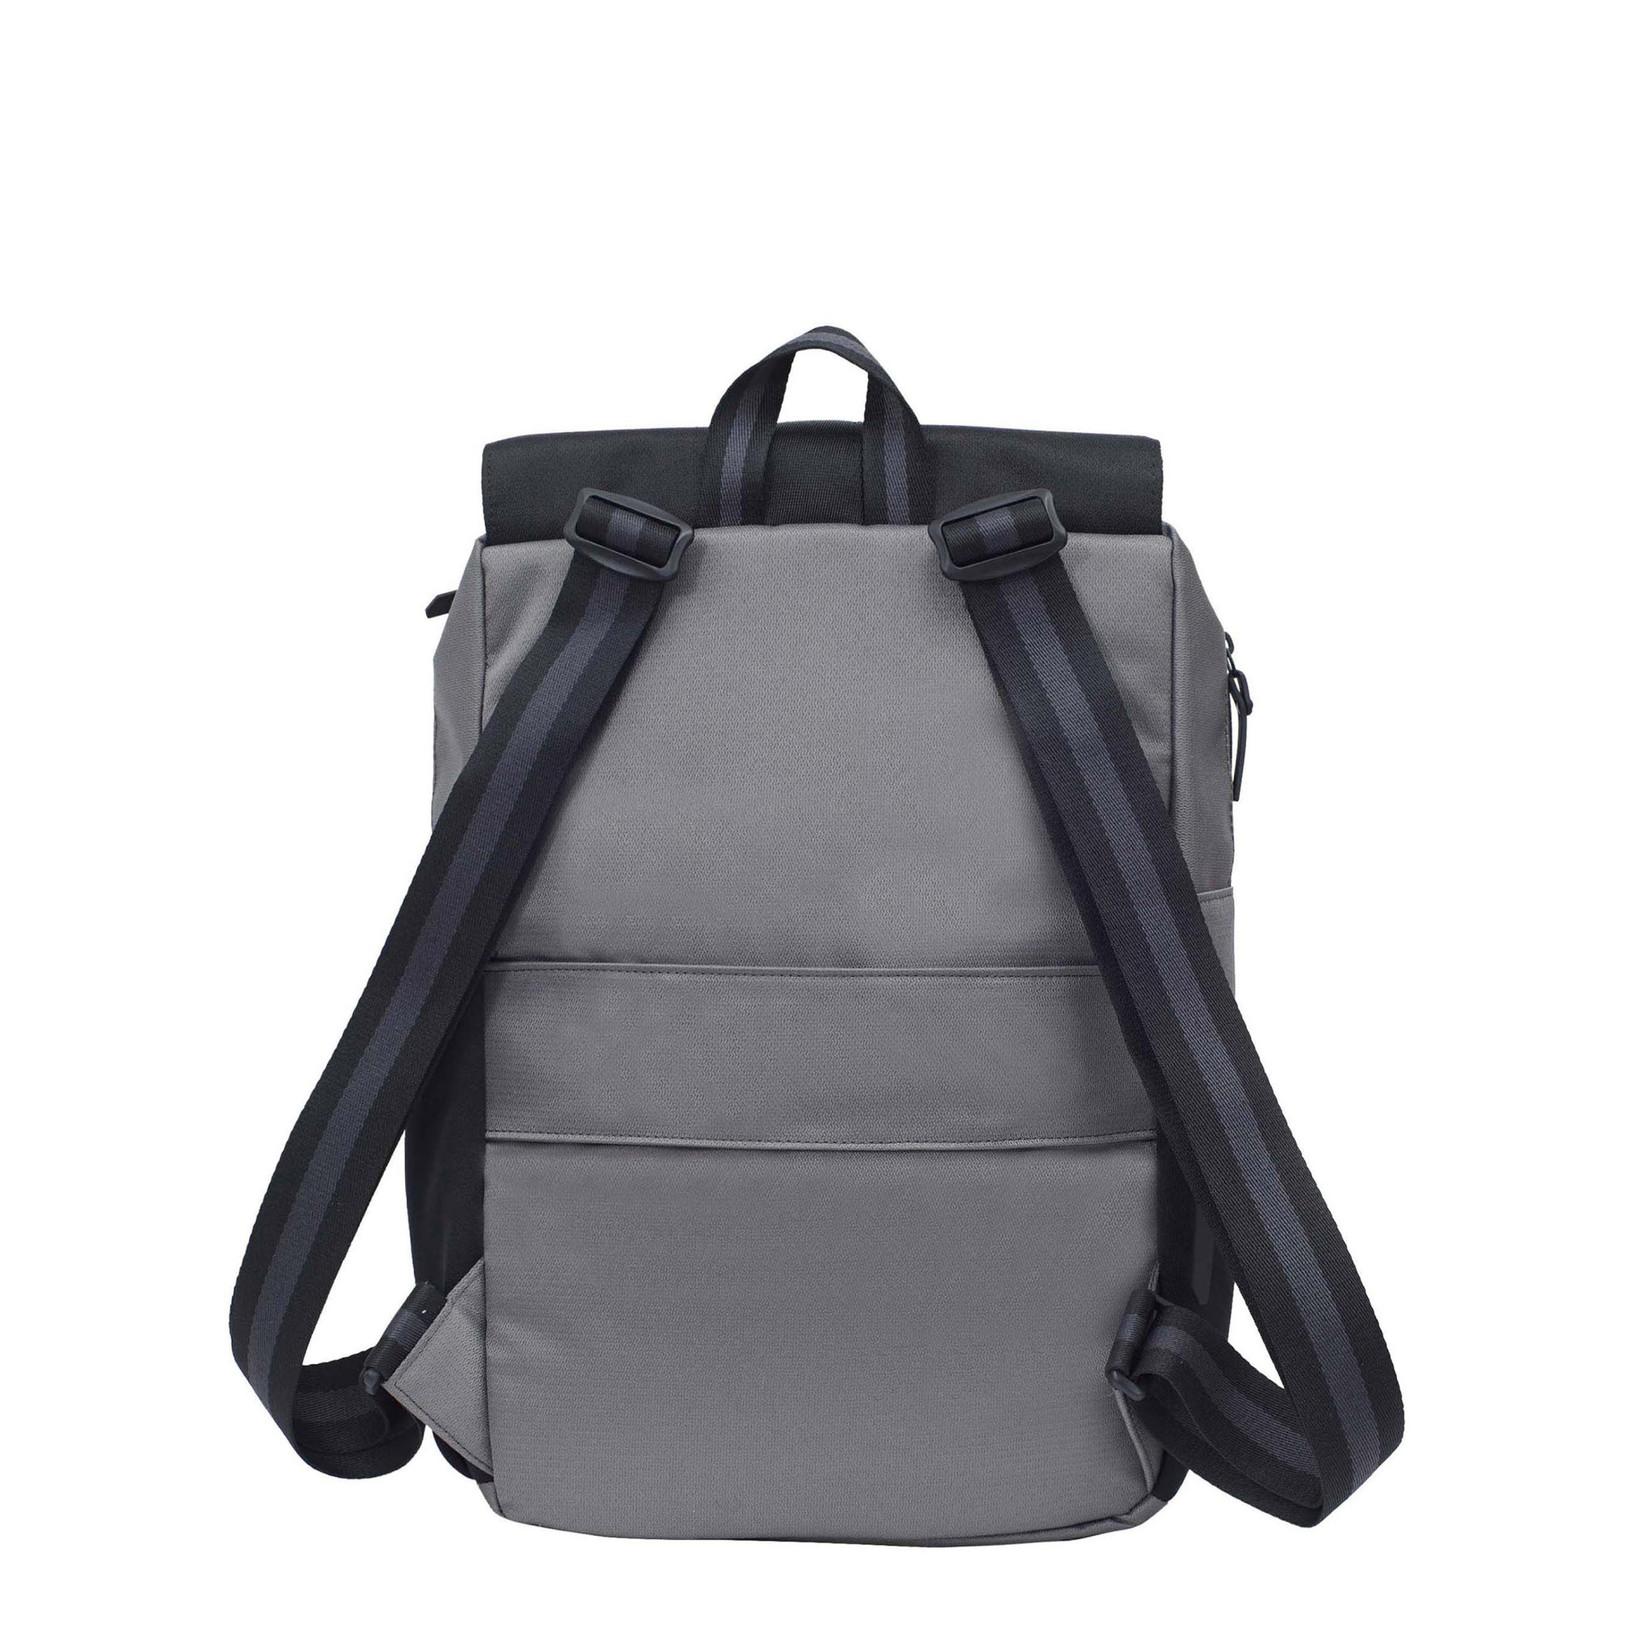 Sherpani Pace Backpack - Flint/Raven